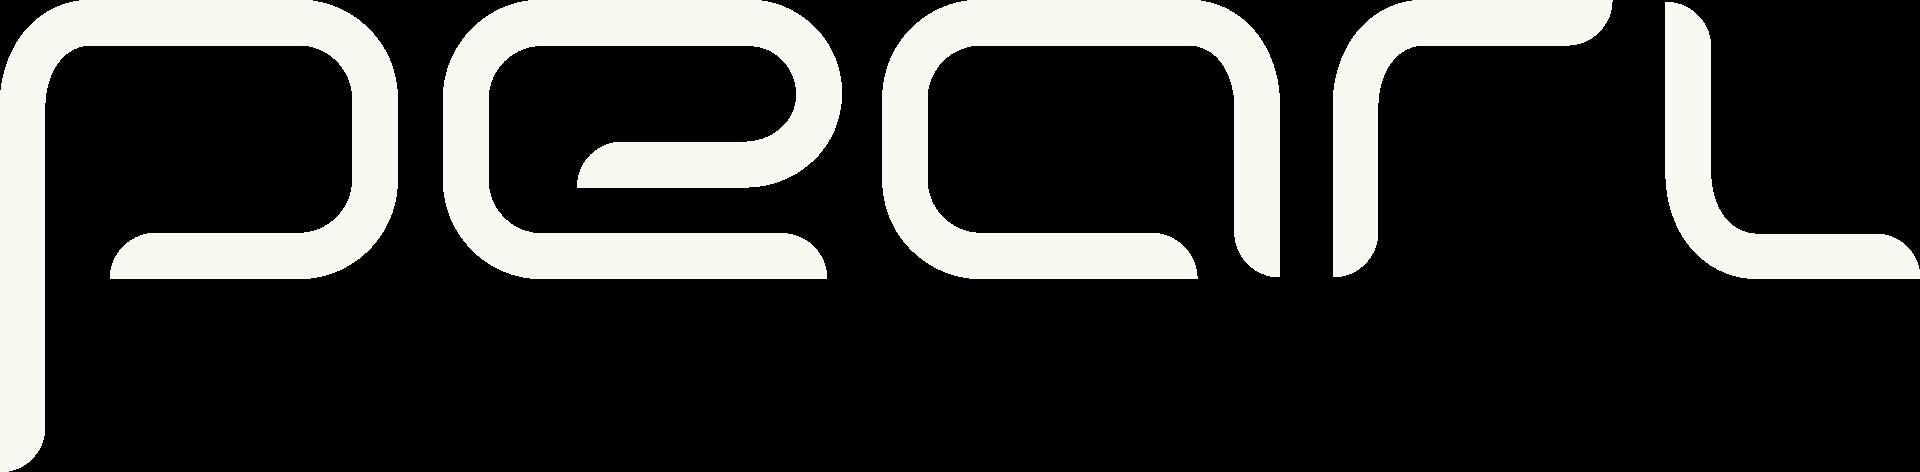 pearl-logo-white